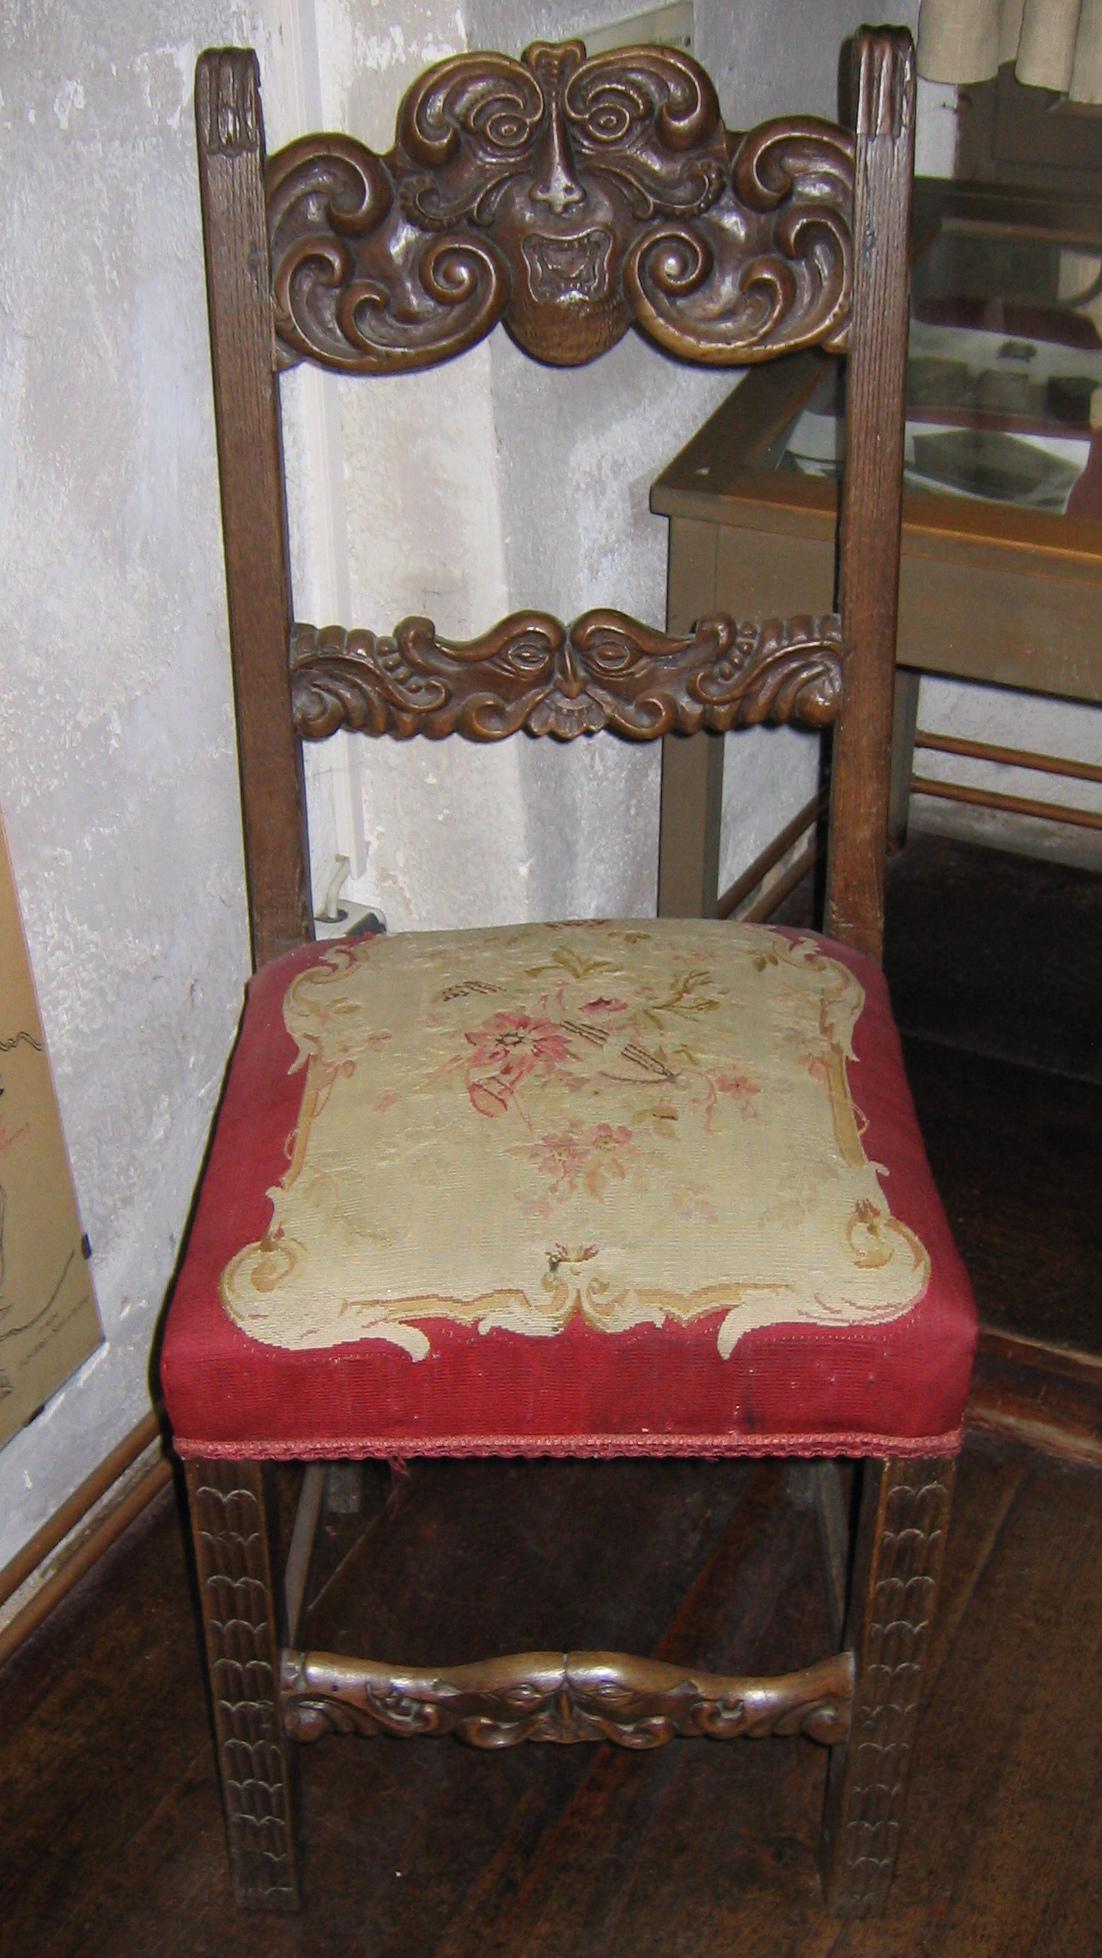 file rodt historiengewoelbe gepolsterter stuhl renaussance wikimedia commons. Black Bedroom Furniture Sets. Home Design Ideas